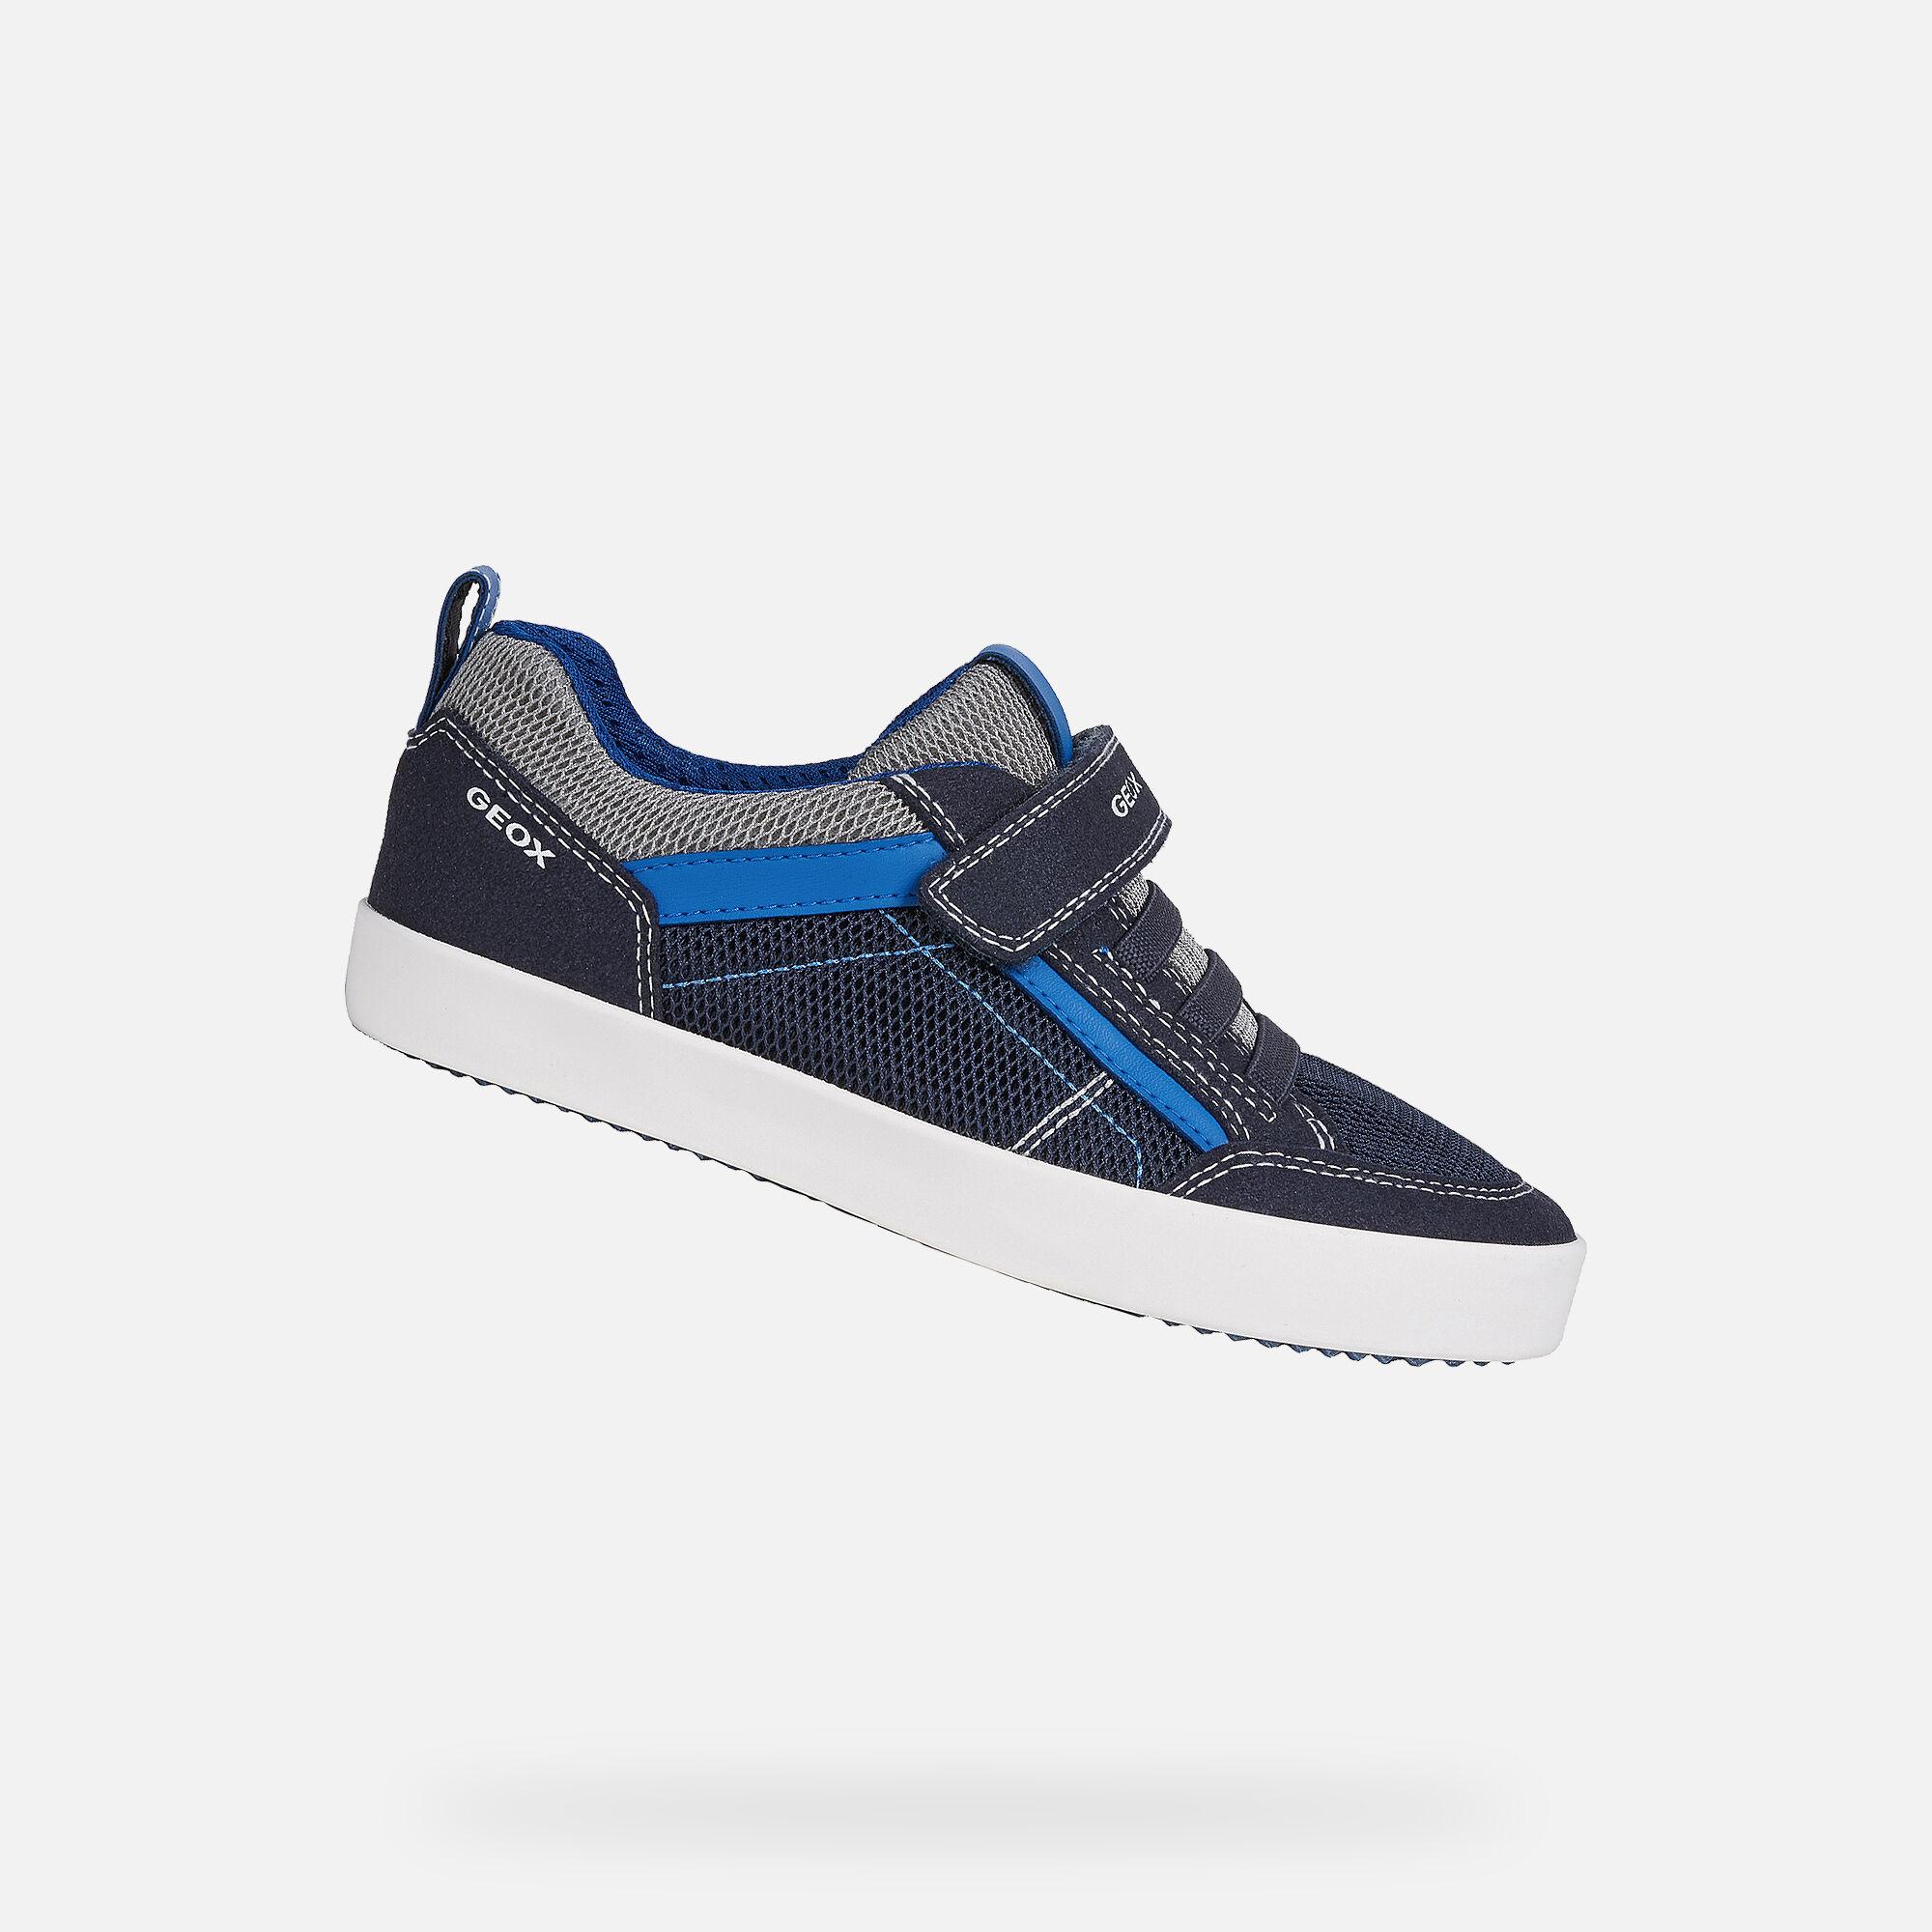 Geox KILWI Boy Navy Sneakers | Geox